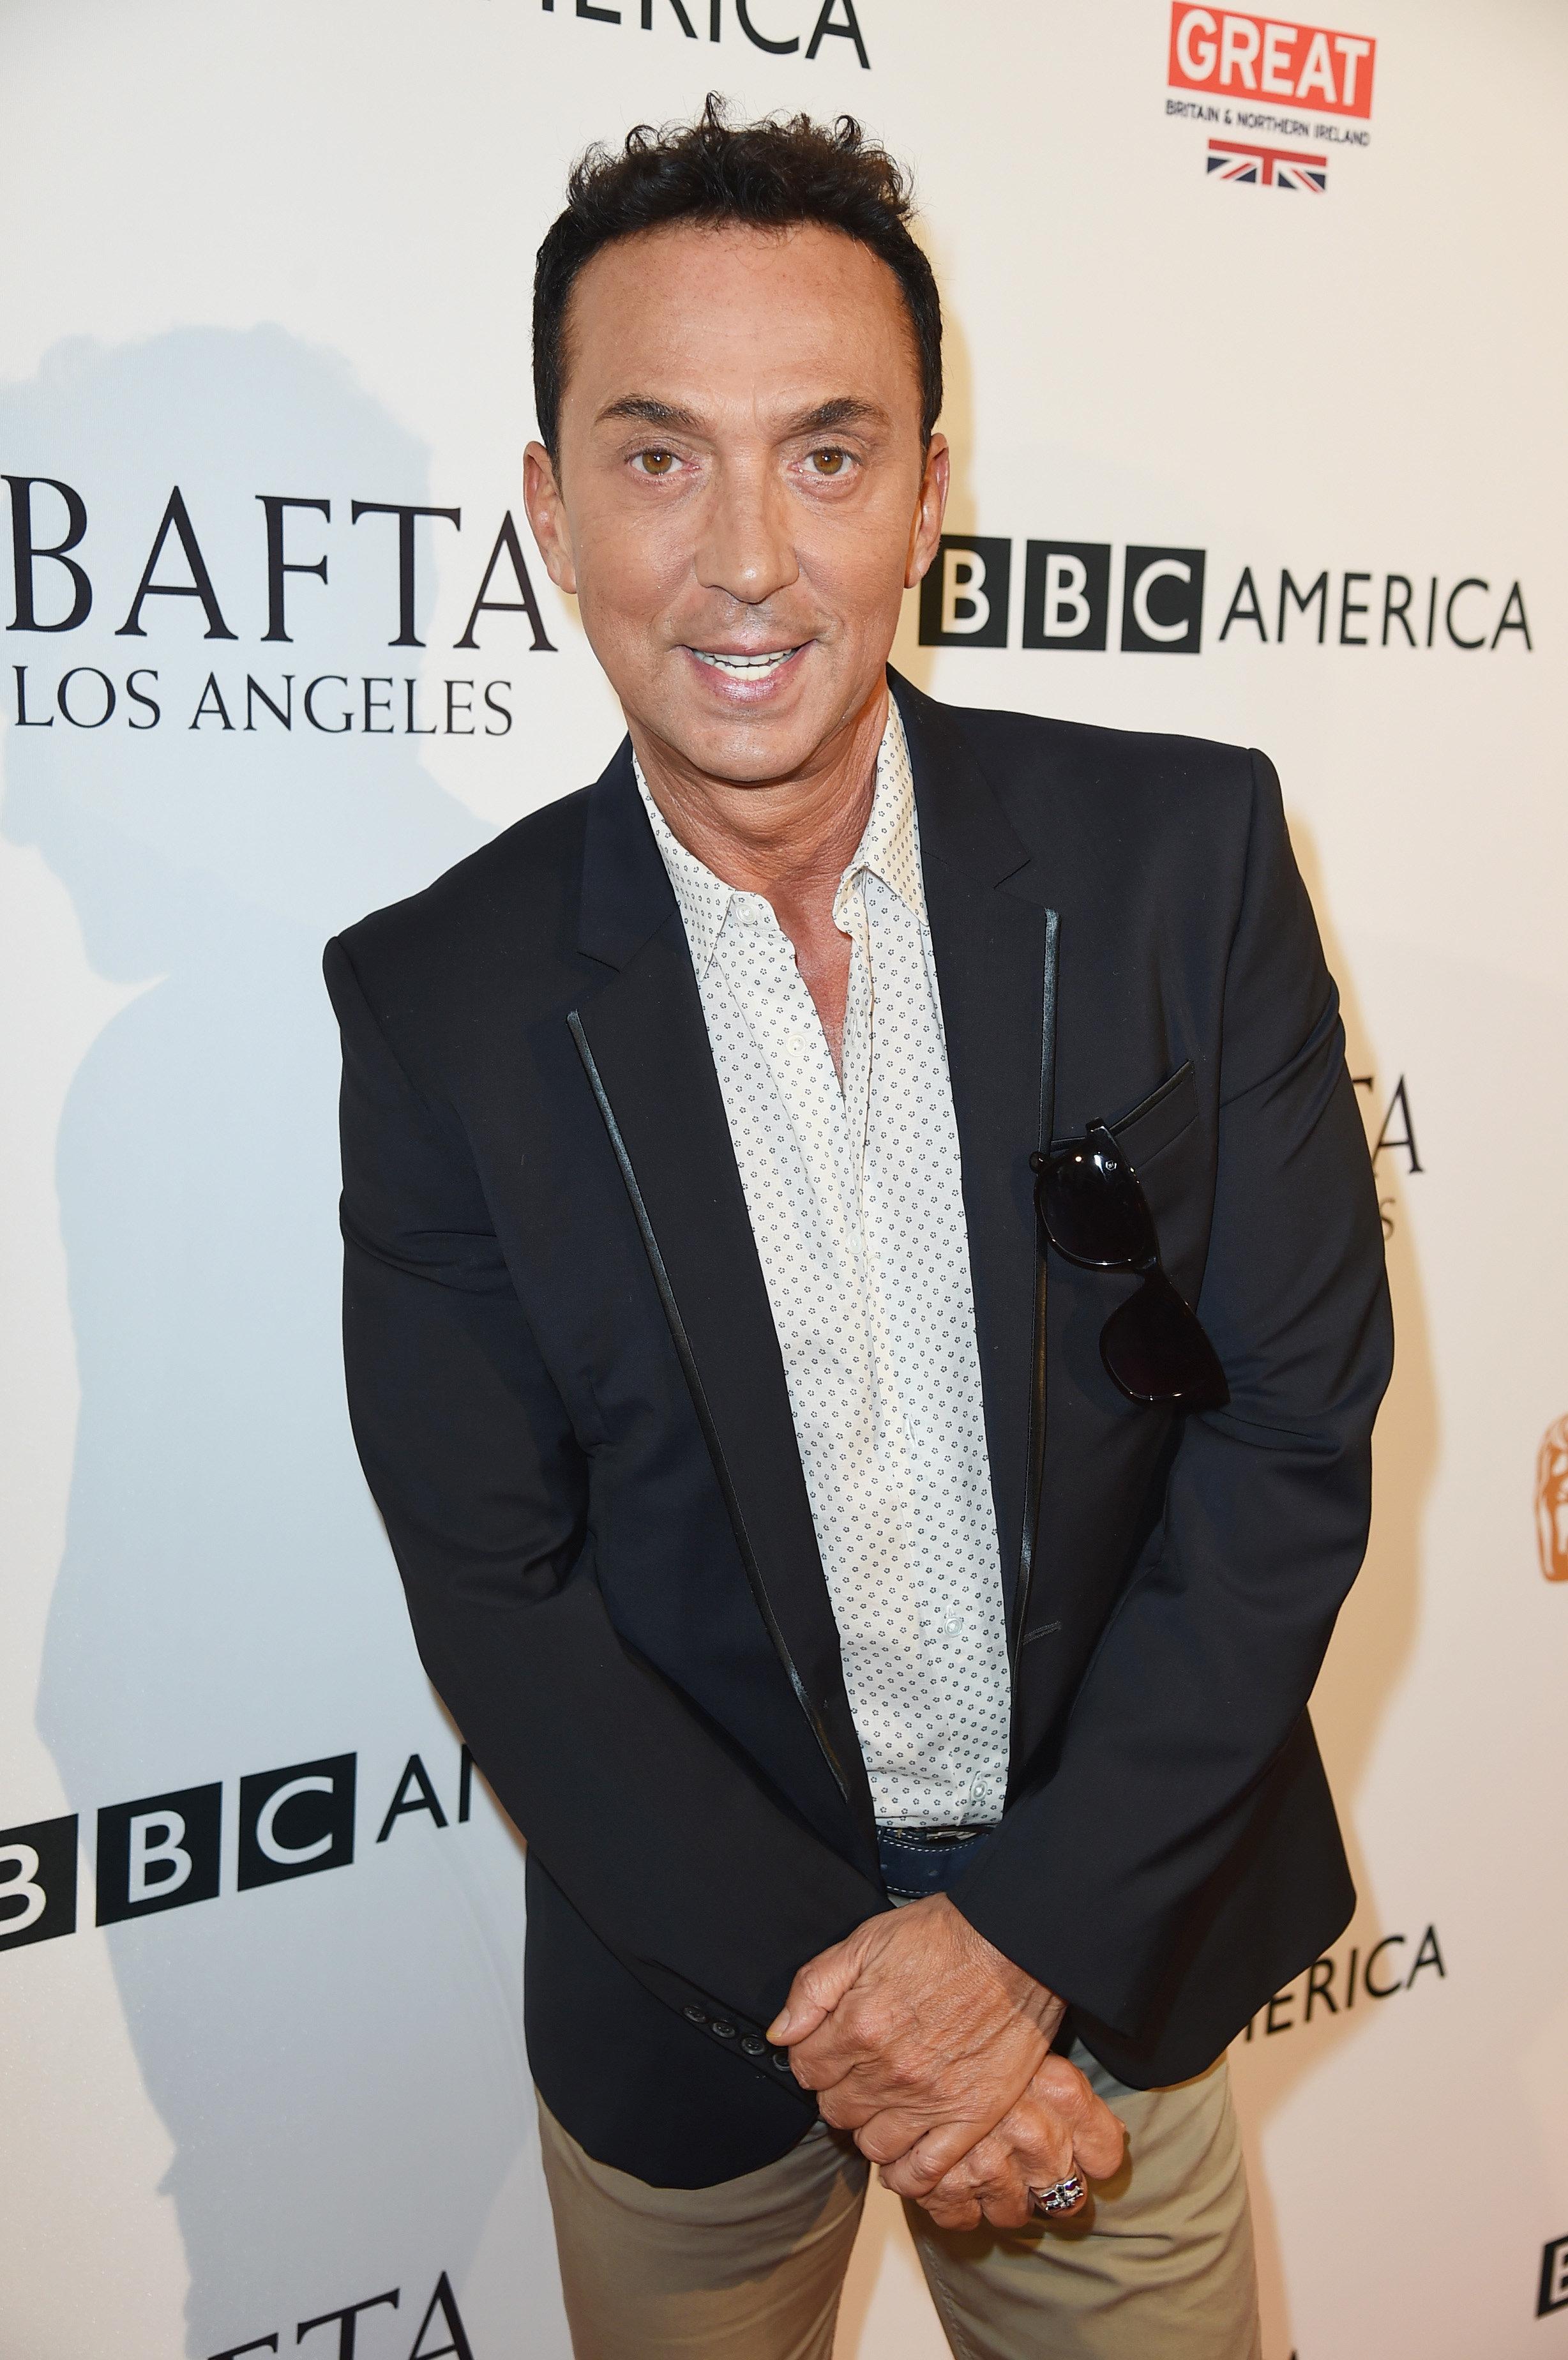 'Strictly Come Dancing' Judge Bruno Tonioli Lands Eurovision